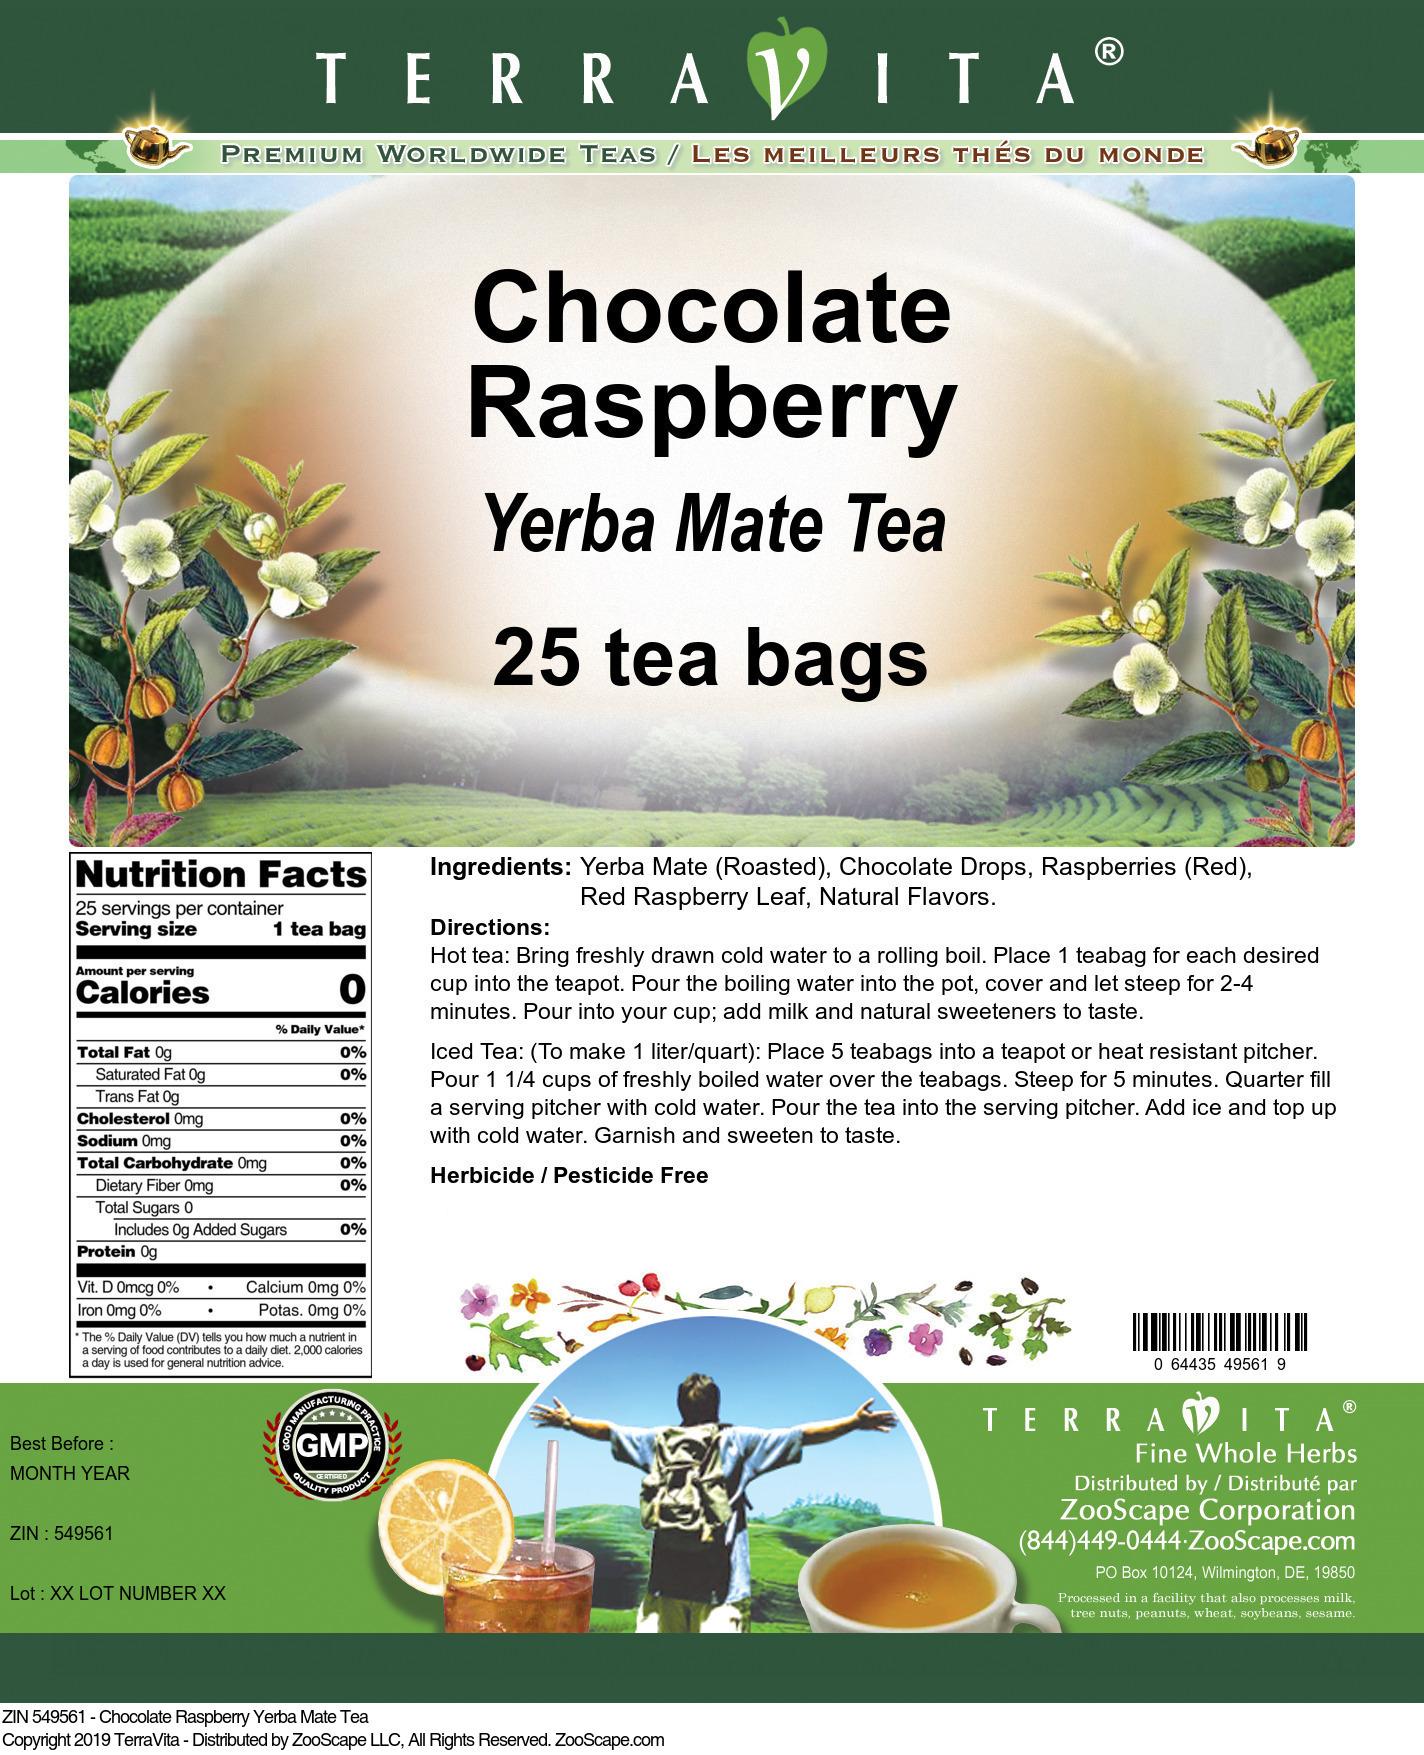 Chocolate Raspberry Yerba Mate Tea